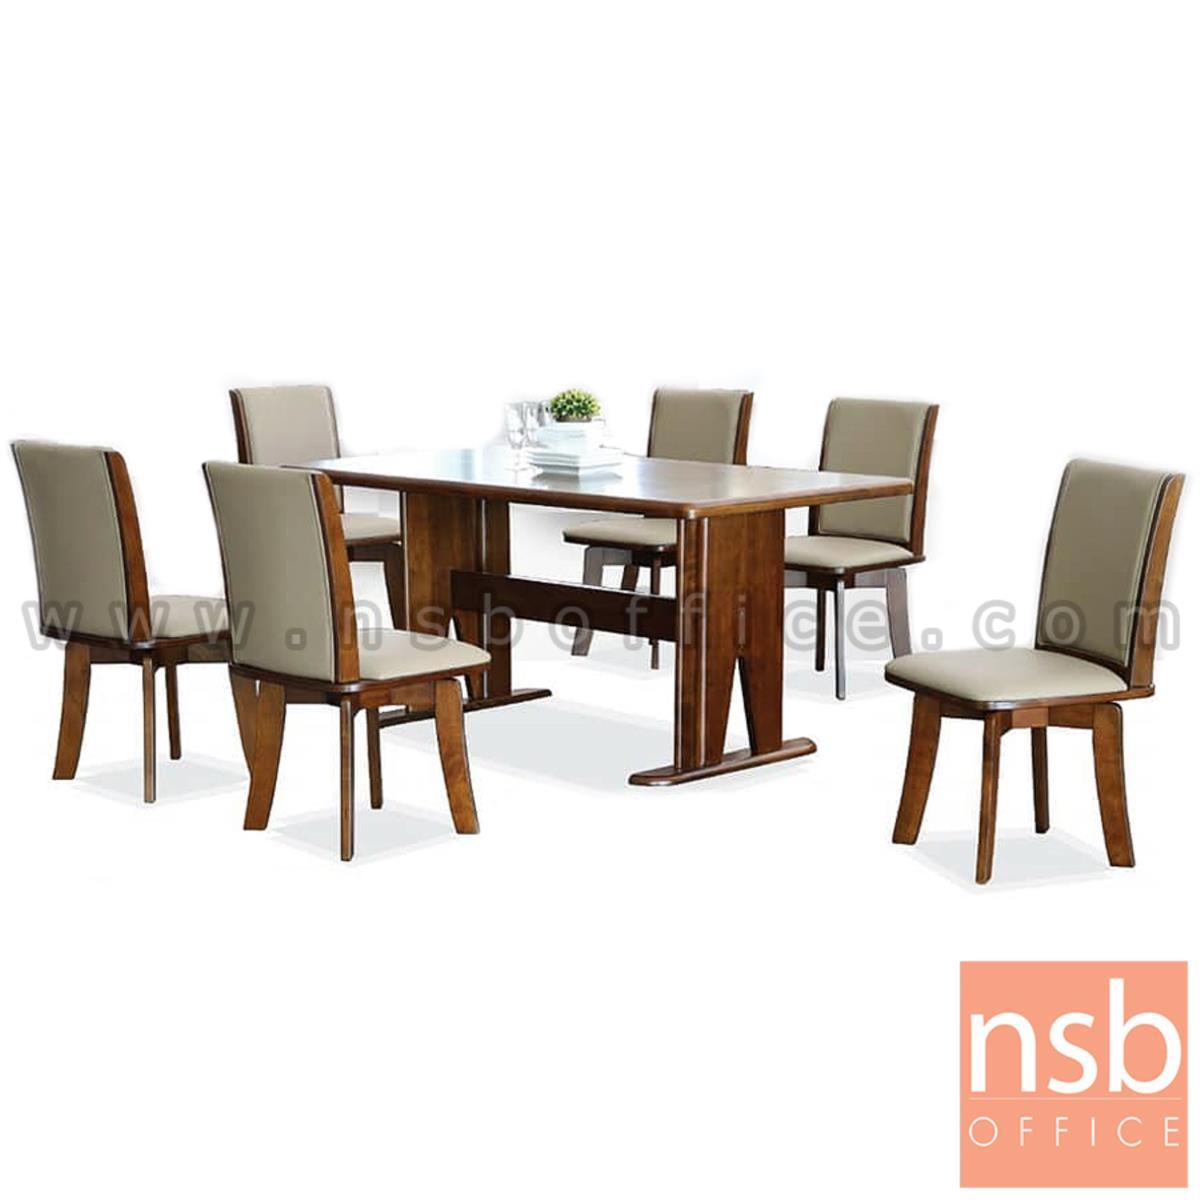 G14A235:ชุดโต๊ะรับประทานอาหาร ไม้ยางพารา  รุ่น Winsley (วินส์ลีย์) 6 ที่นั่ง พร้อมเก้าอี้